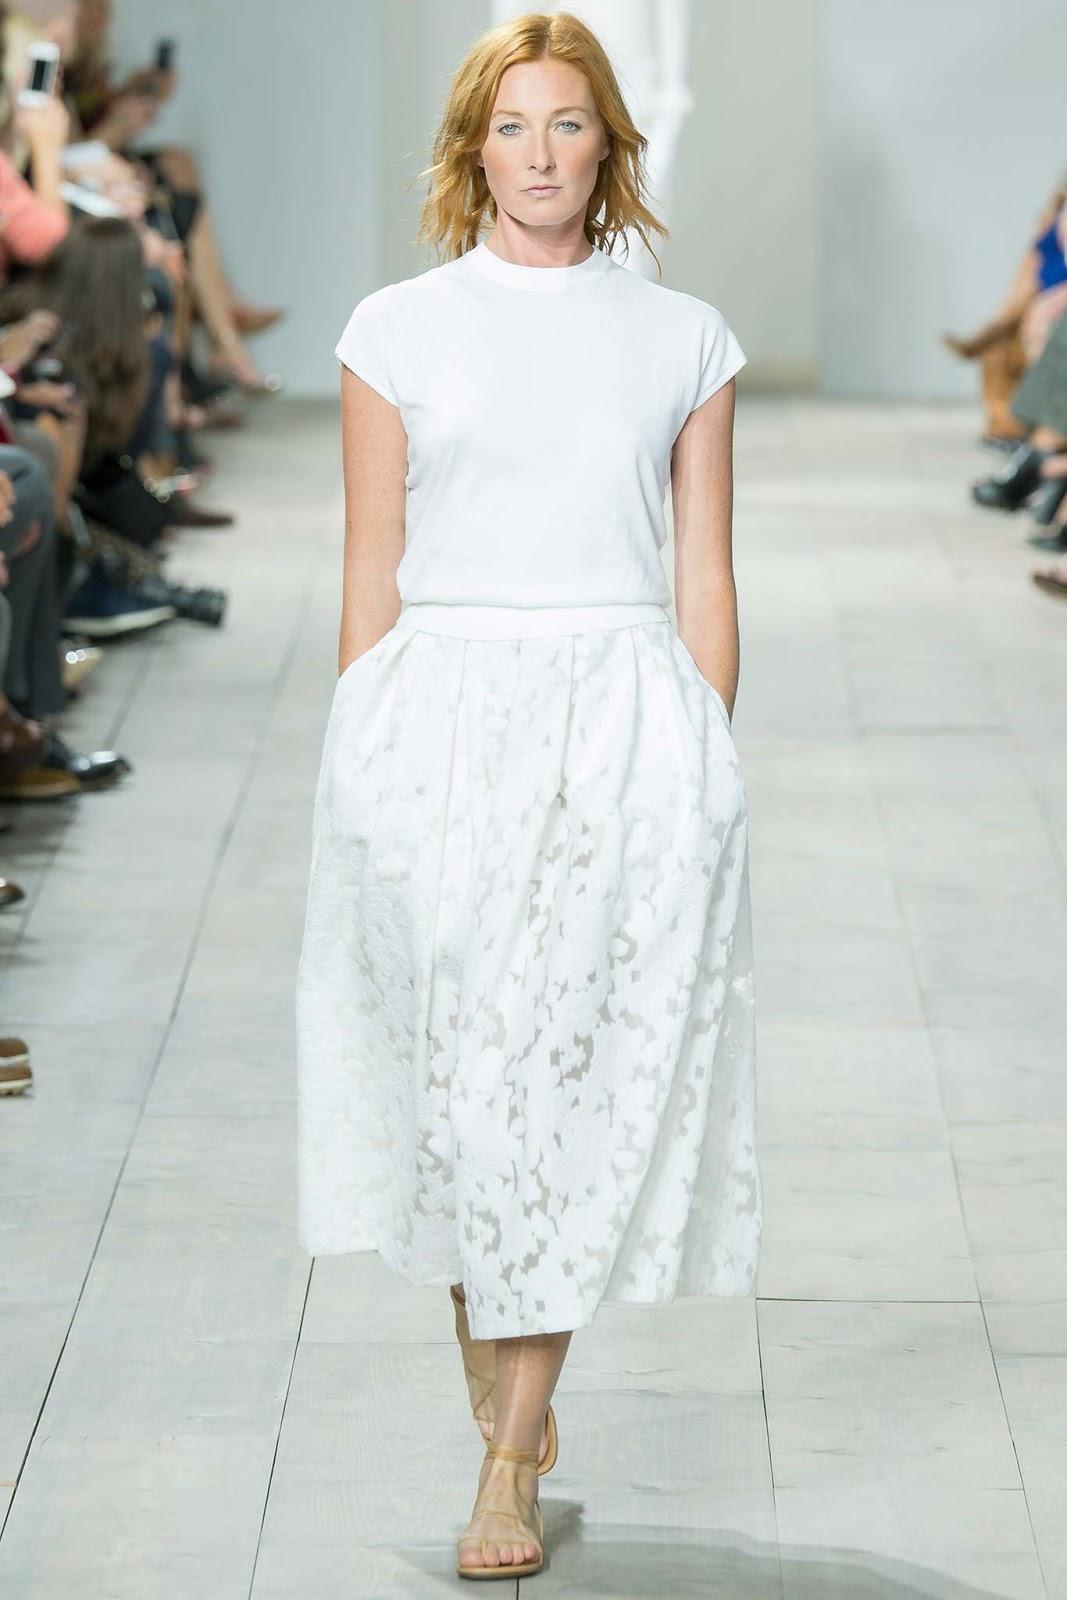 bílé šaty rtw 2015 kors